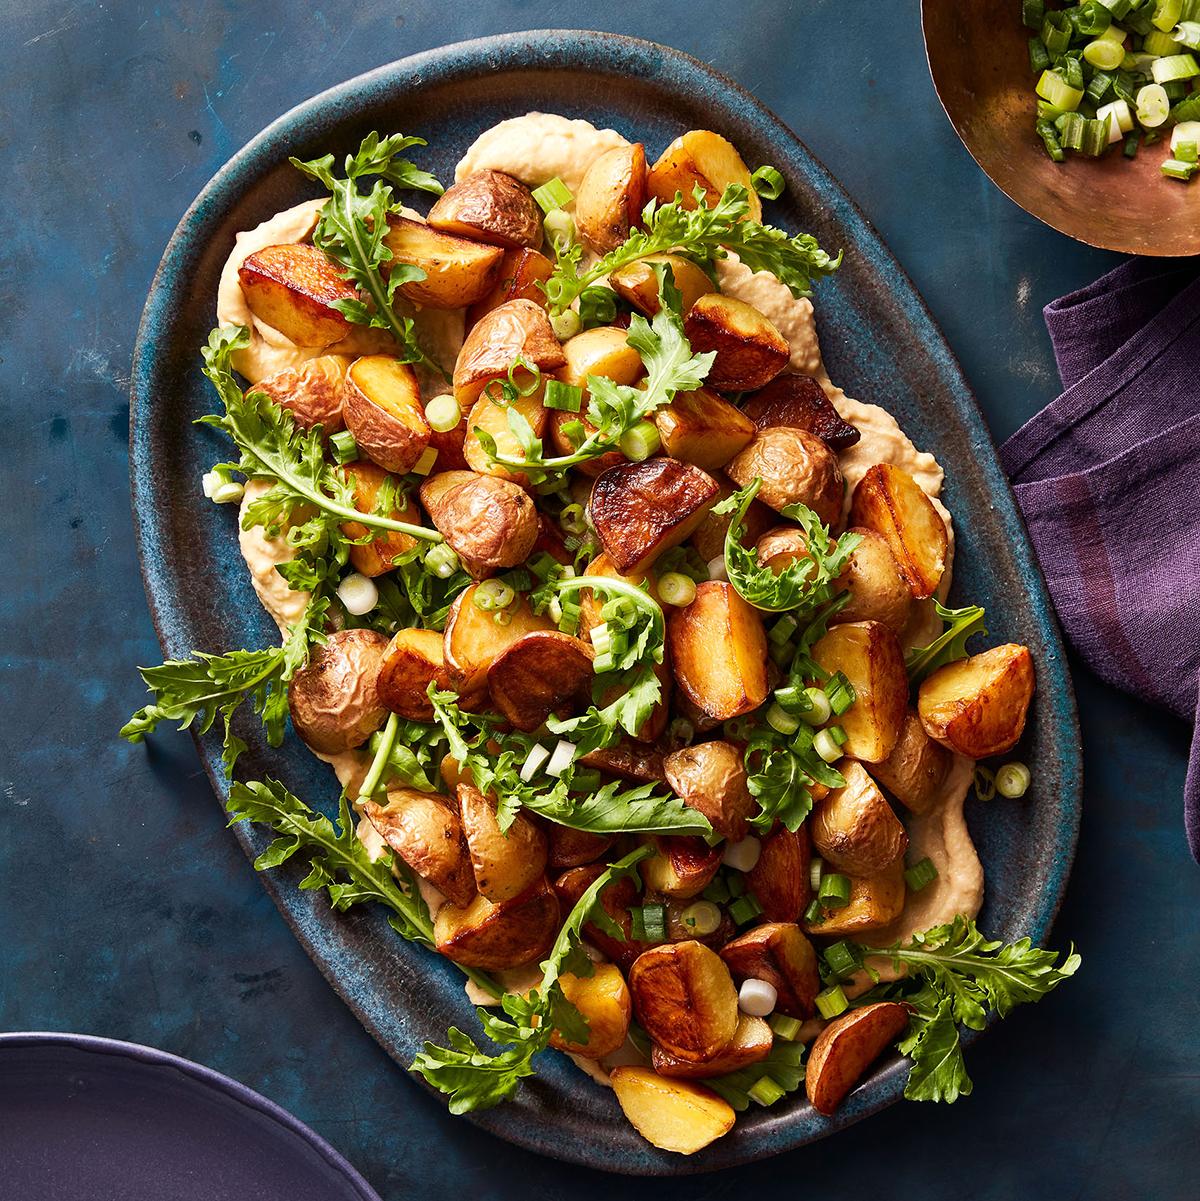 warm potato salad with hummus arugula